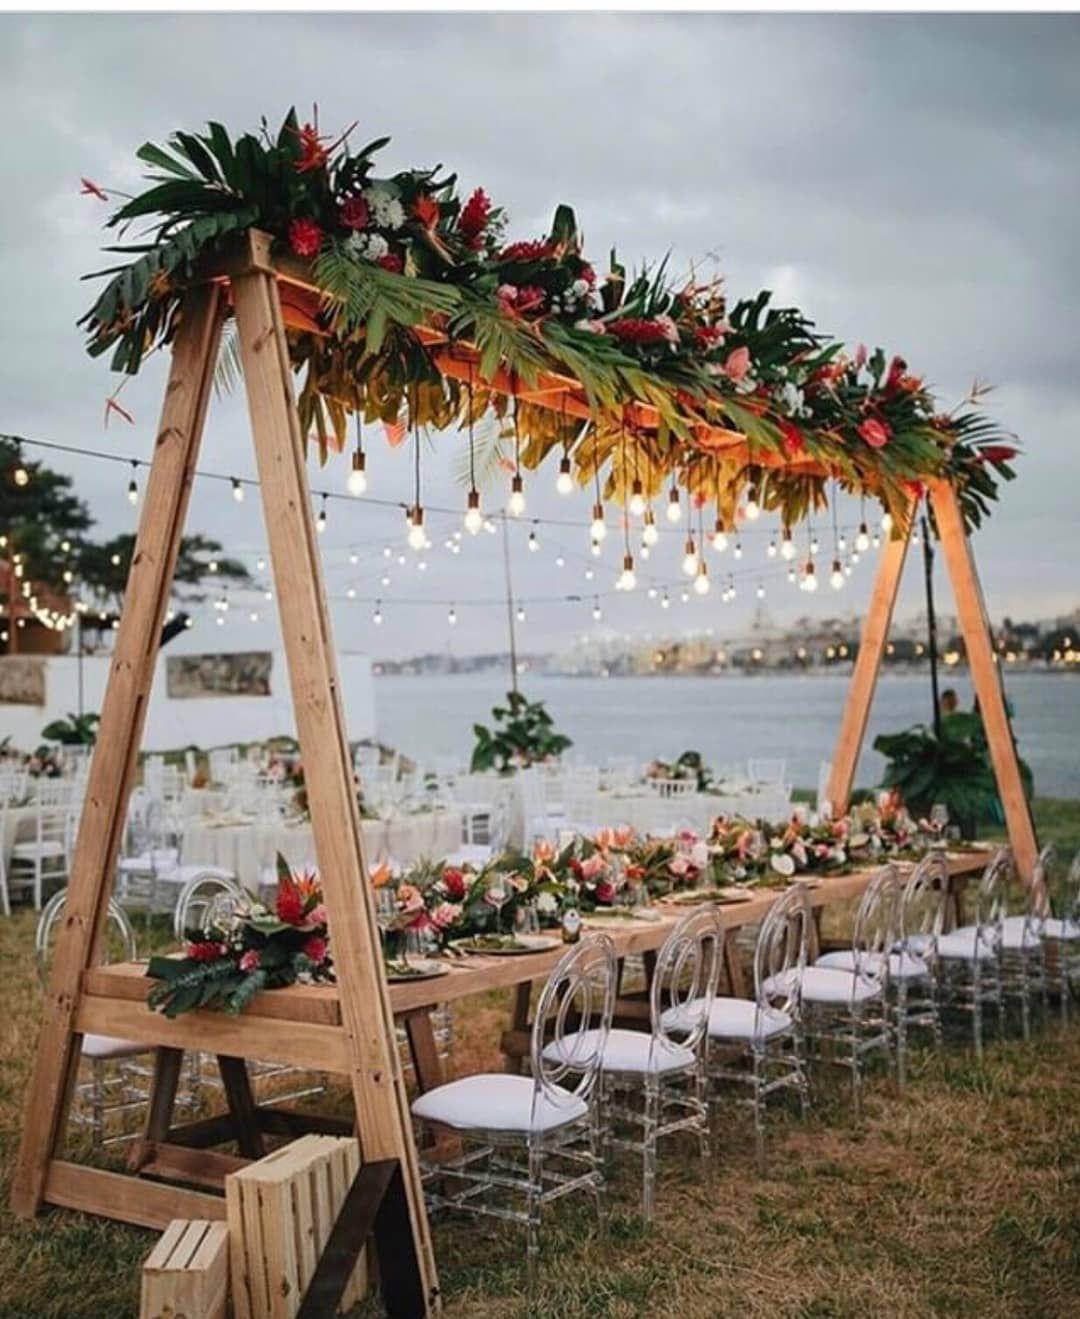 80 Vintage And Elegant Wedding Decoration Ideas Wedding Decor Elegant Wedding Decorations Elegant Wedding